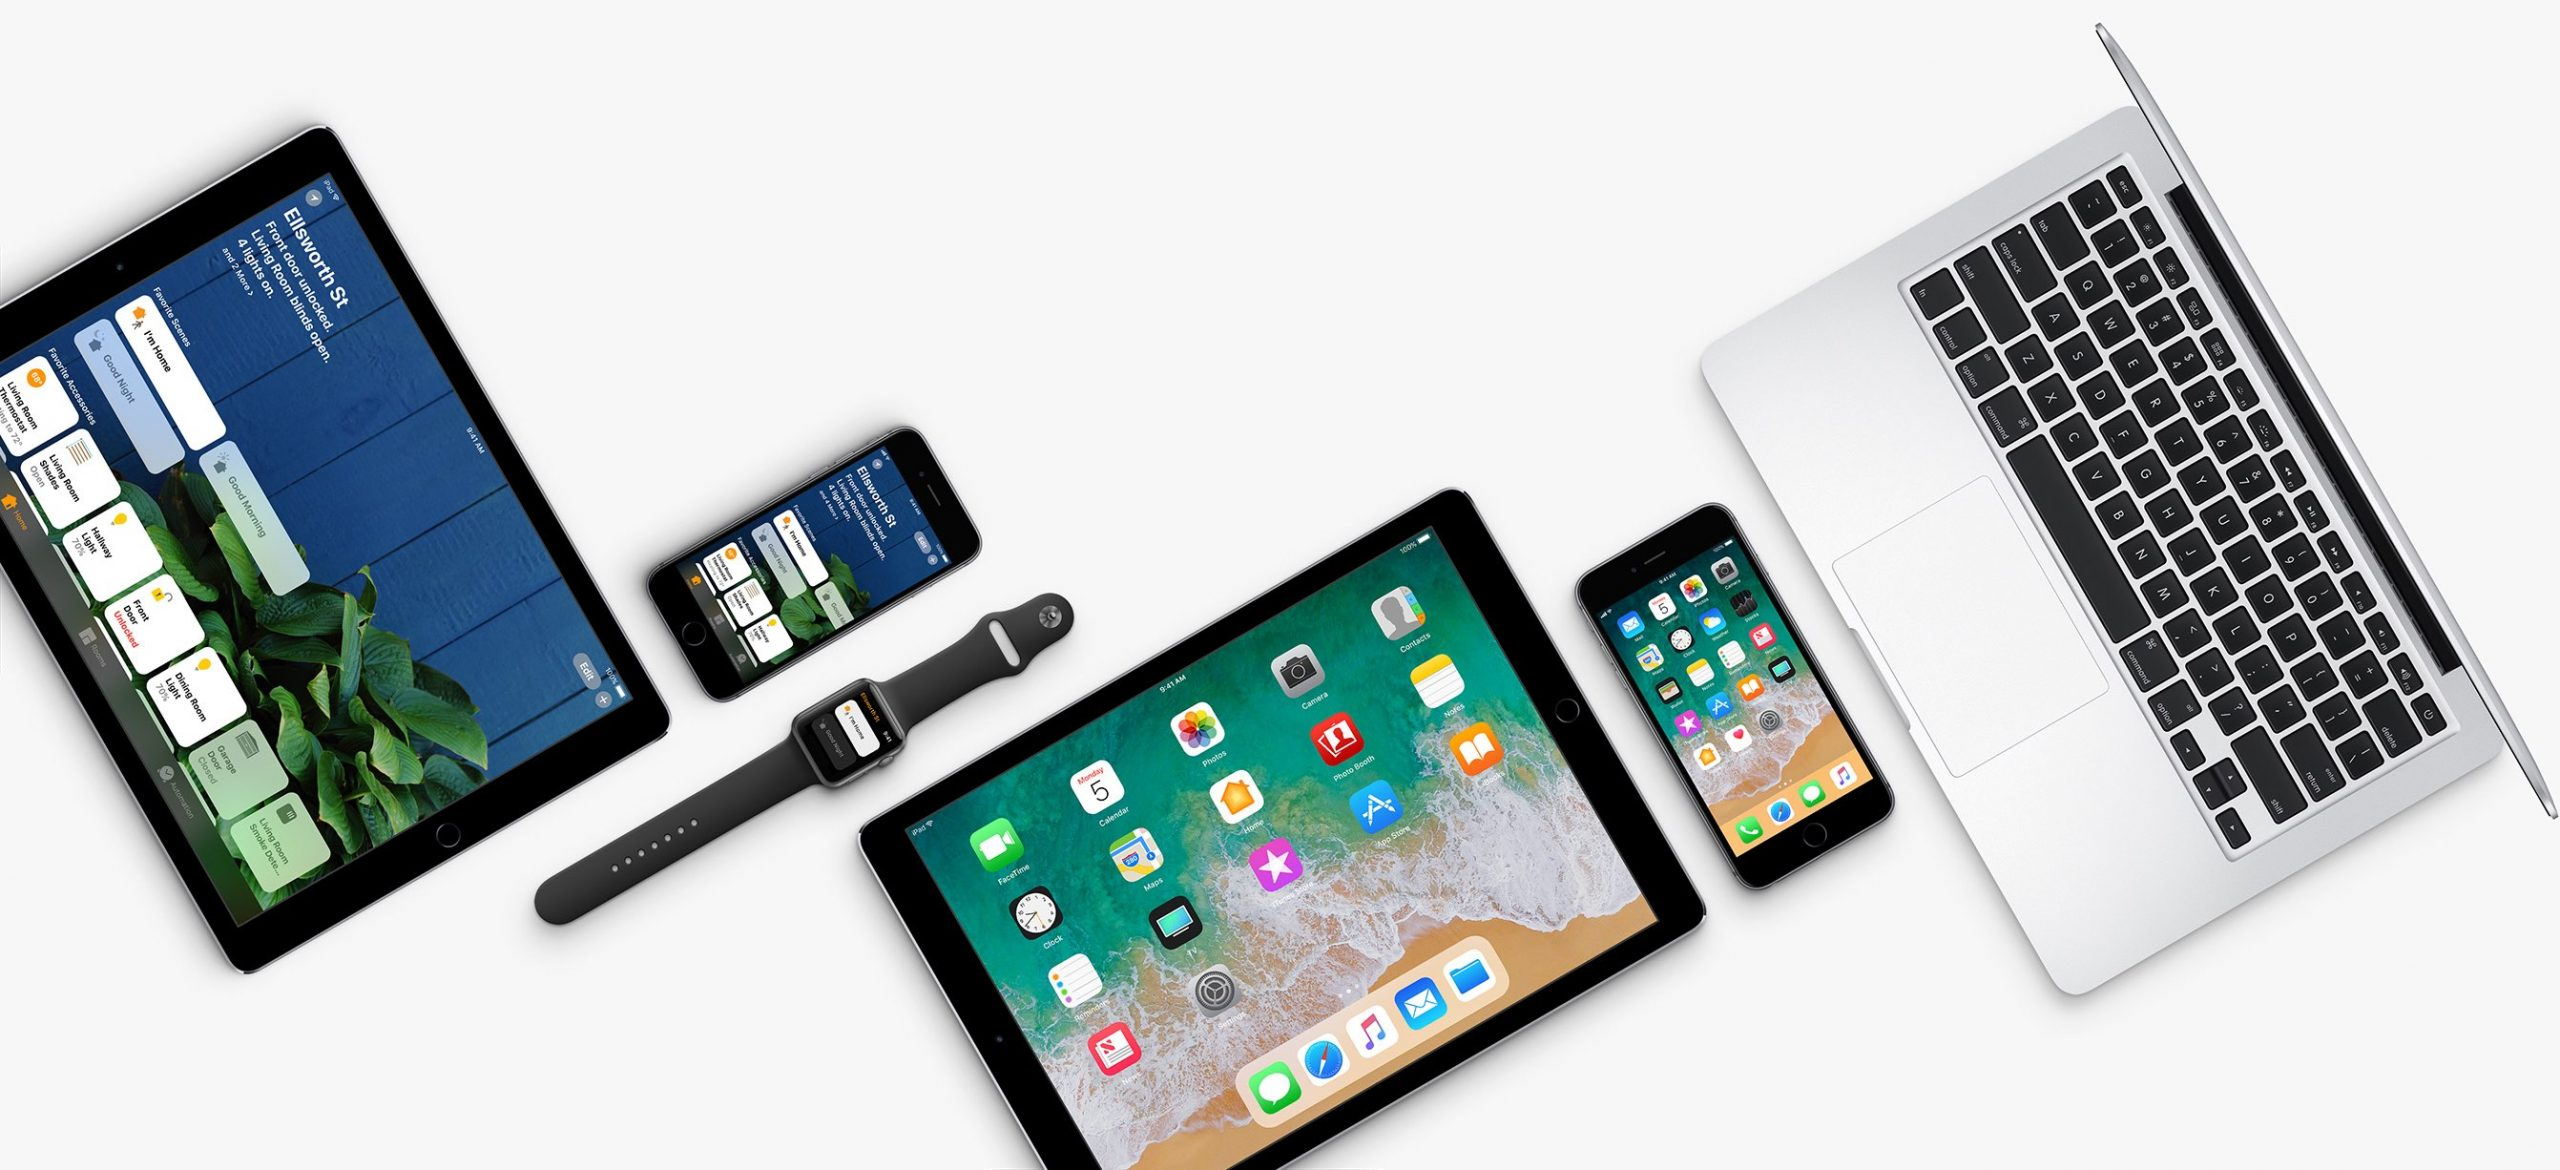 Active Apple Devices Reached 1.5 Billion Units Milestone - CEO Tim Cook